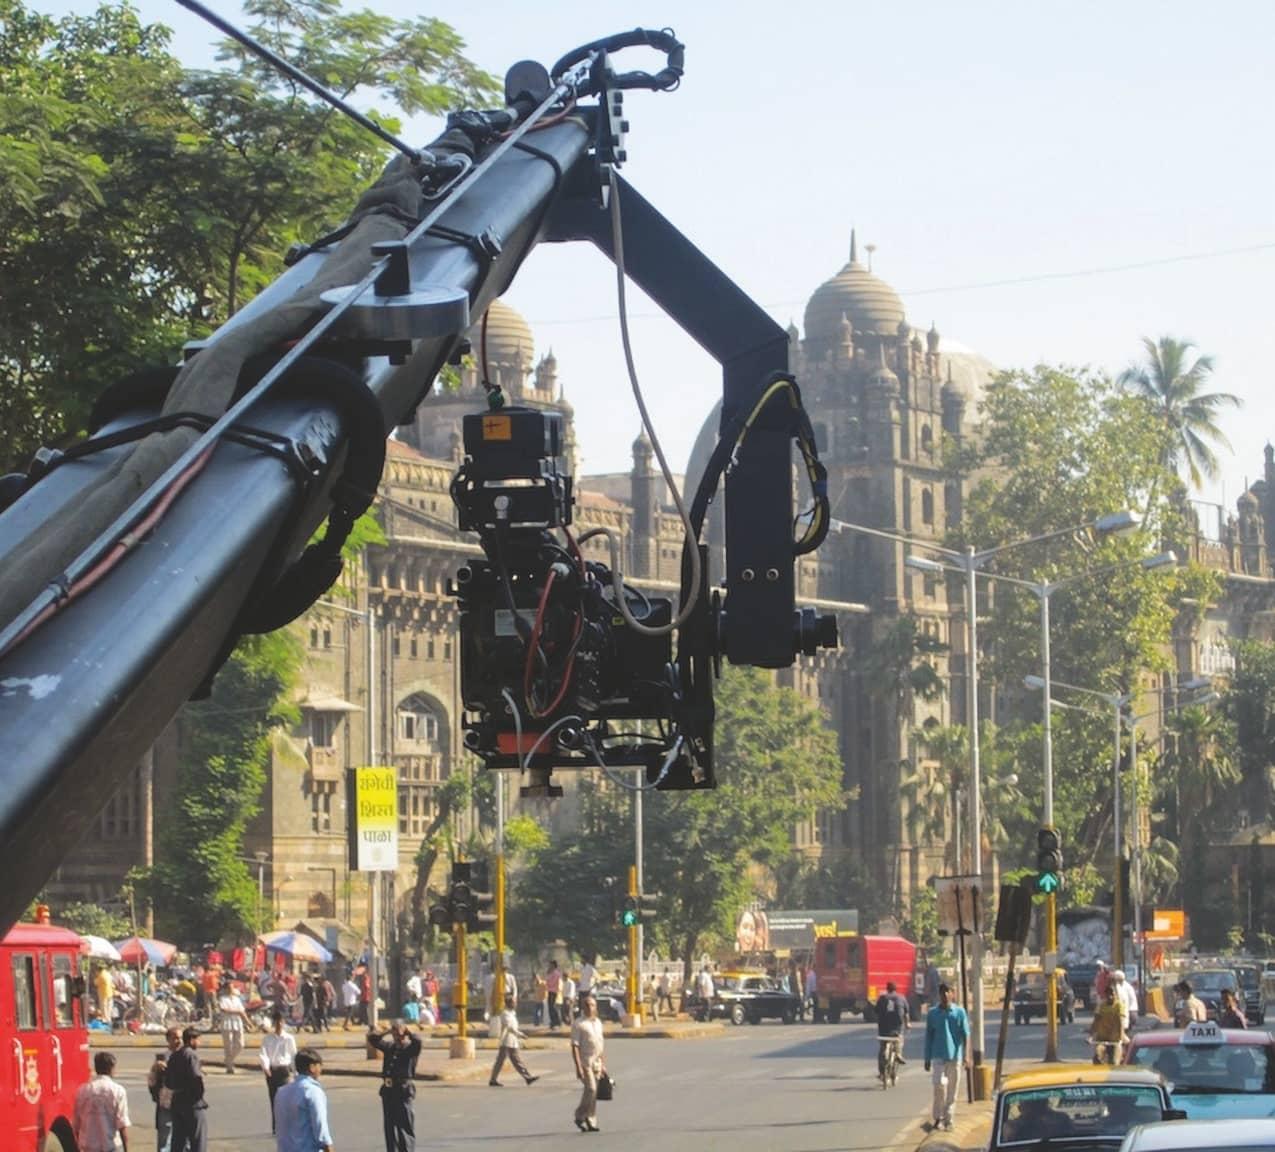 GOVT SOPS FOR SHOOTING AND RE-STARTING FILM-MAKING:  PRAKASH JAVADEKAR